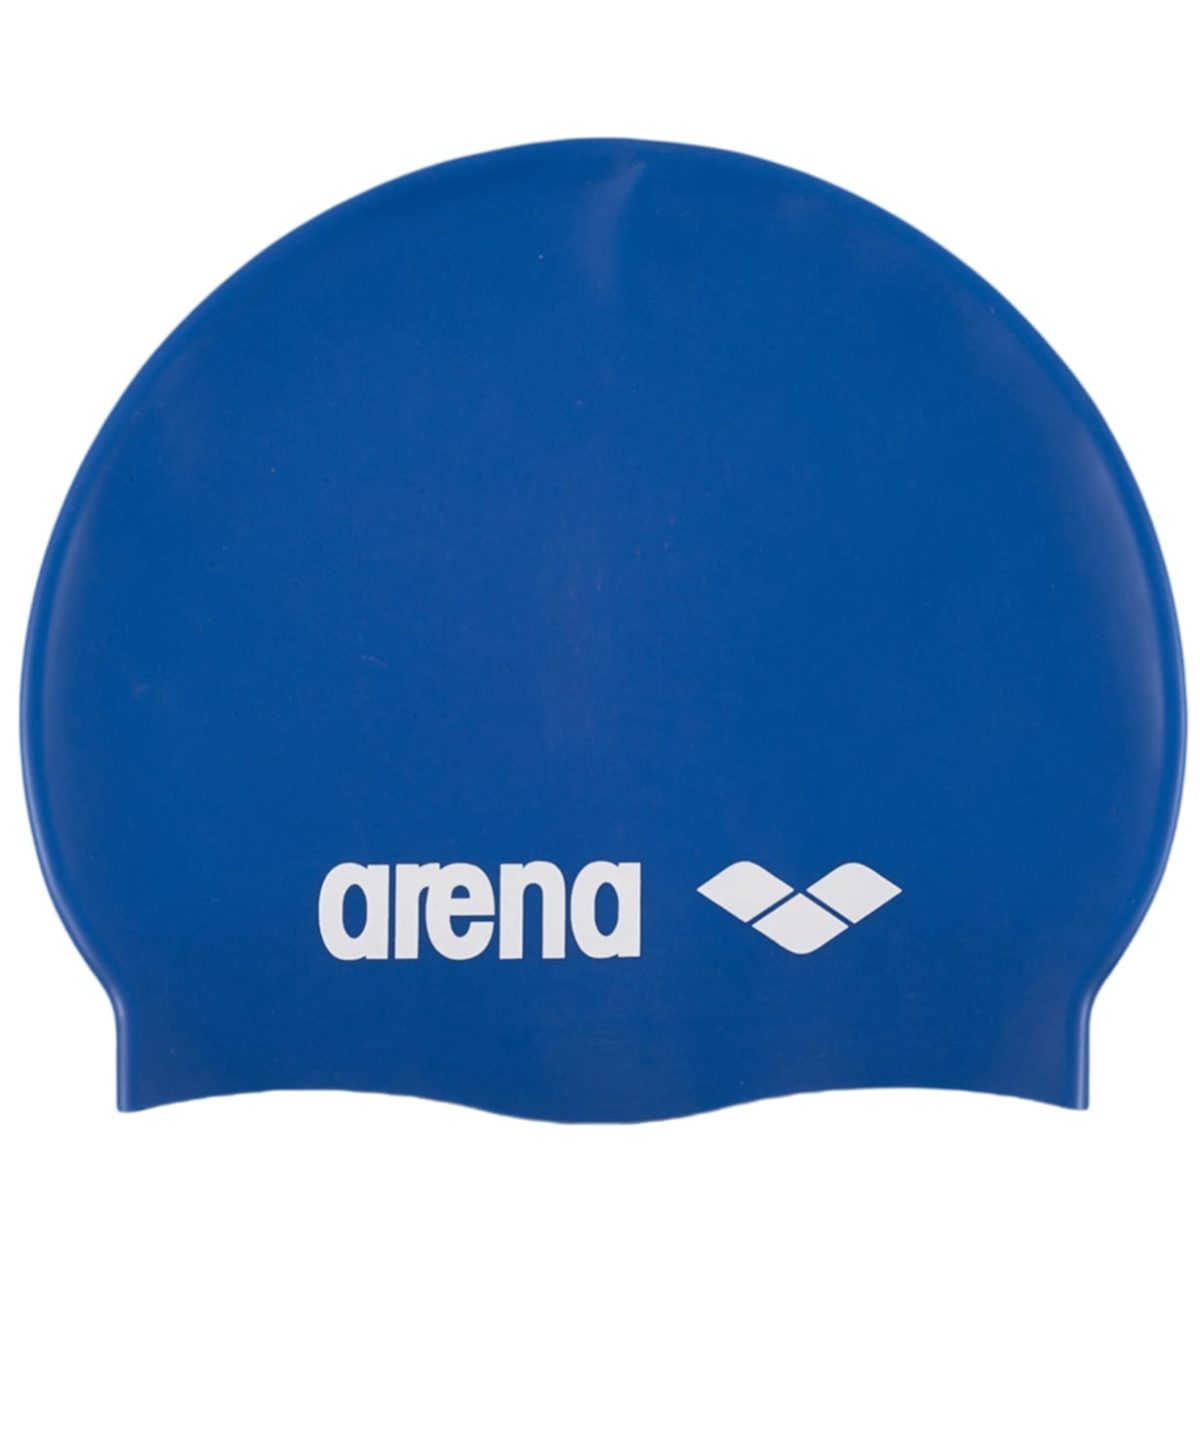 ARENA шапочка для плавания Classic Silicone JR Skyblue/White - 1